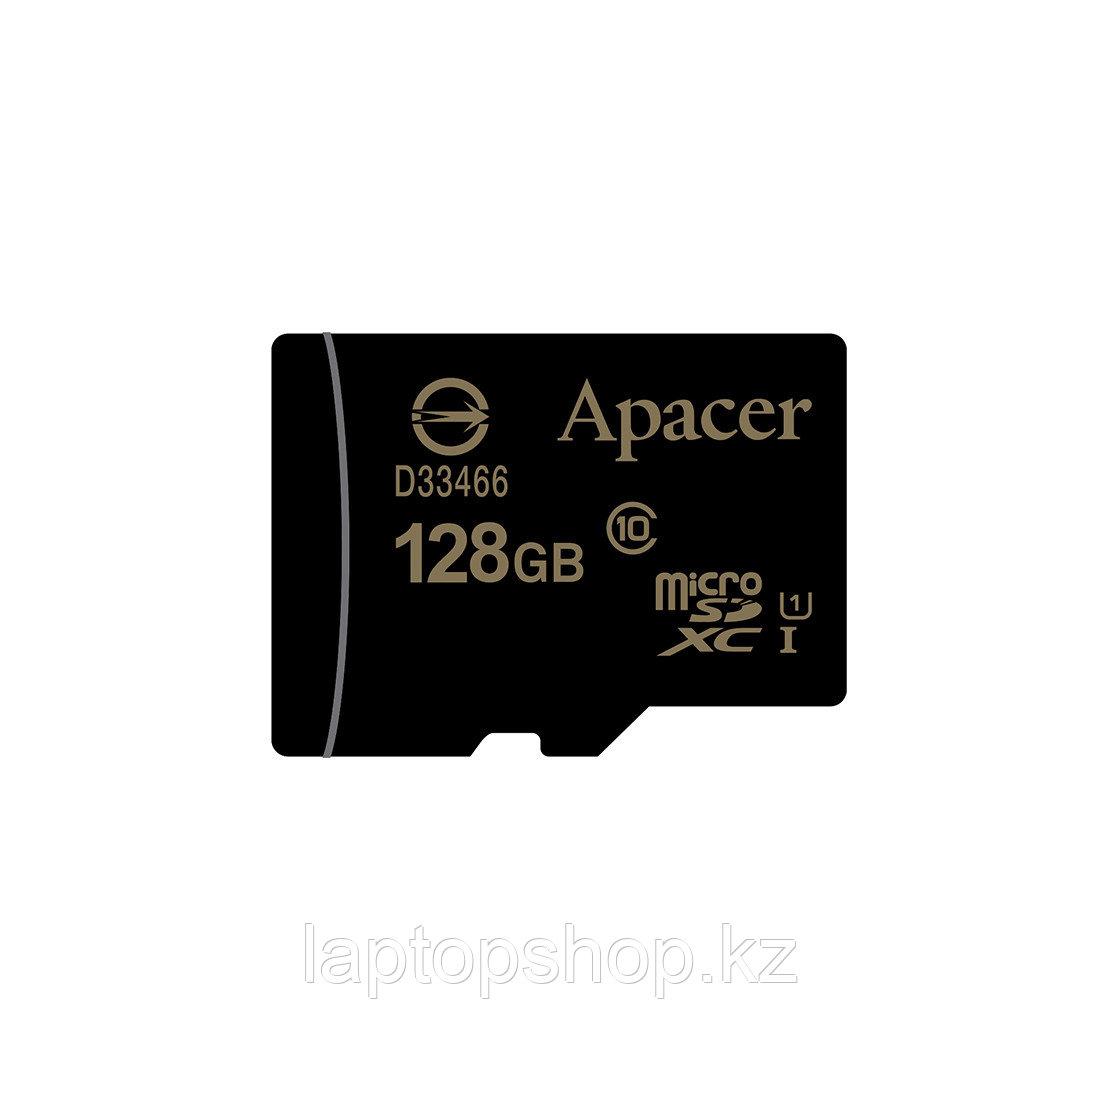 Карта памяти, Apacer, AP128GMCSX10U1-R, MicroSDXC 128GB